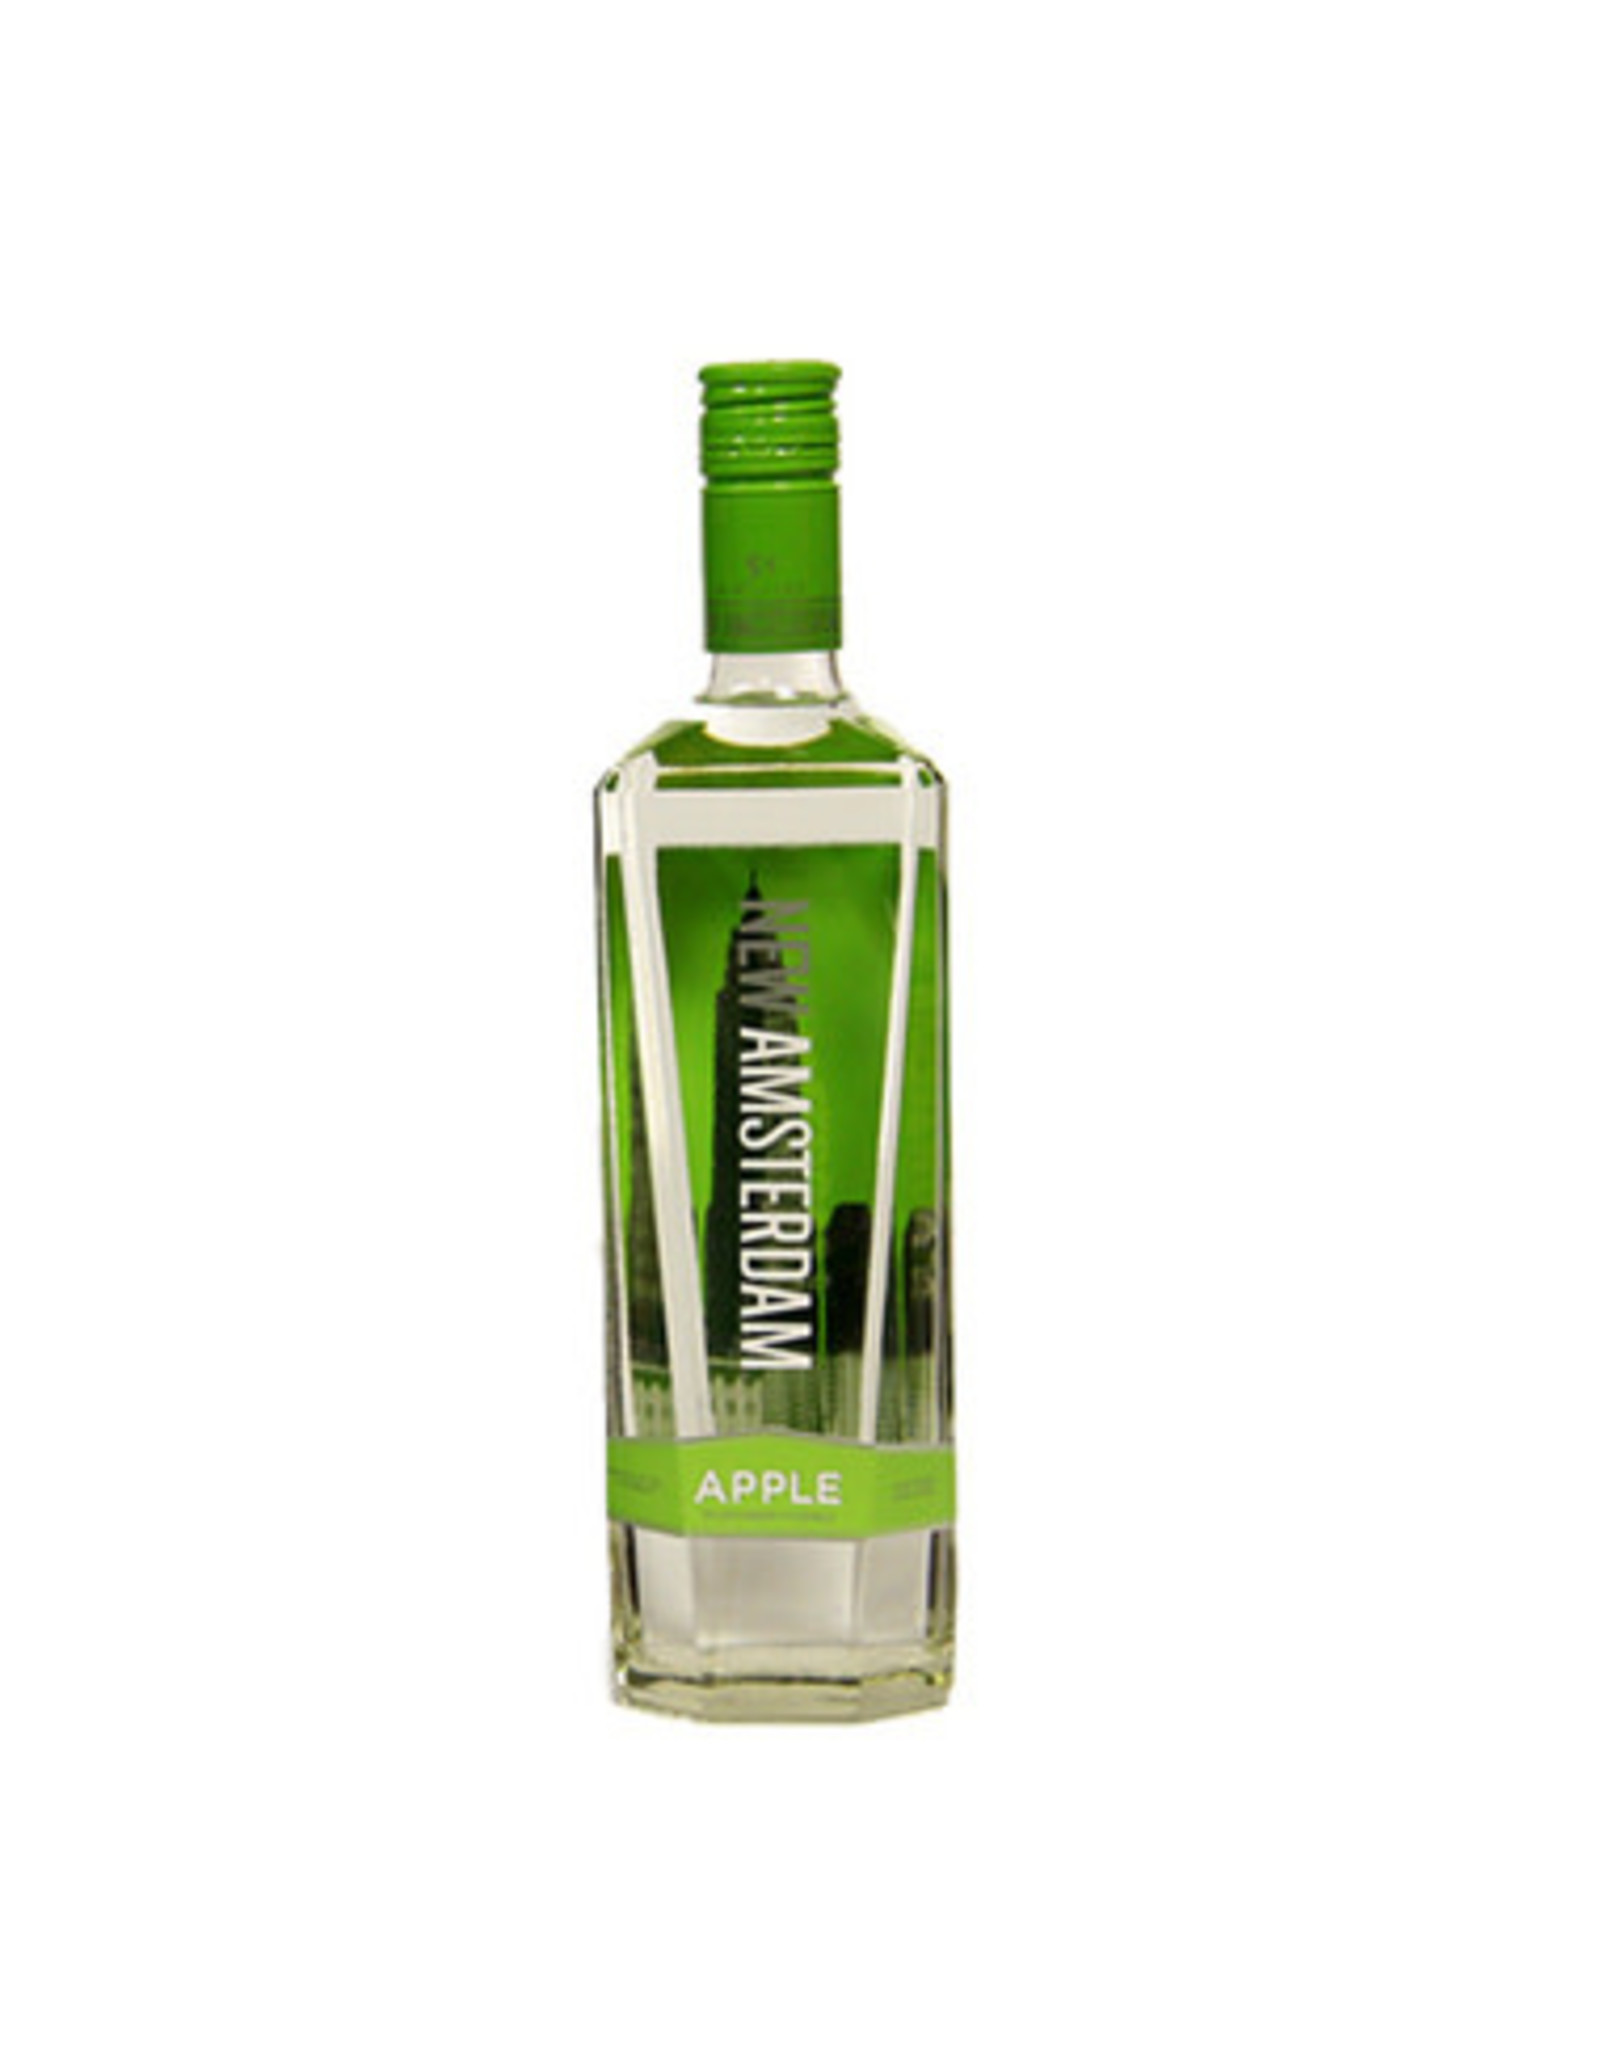 New Amsterdam Apple vodka 750ml